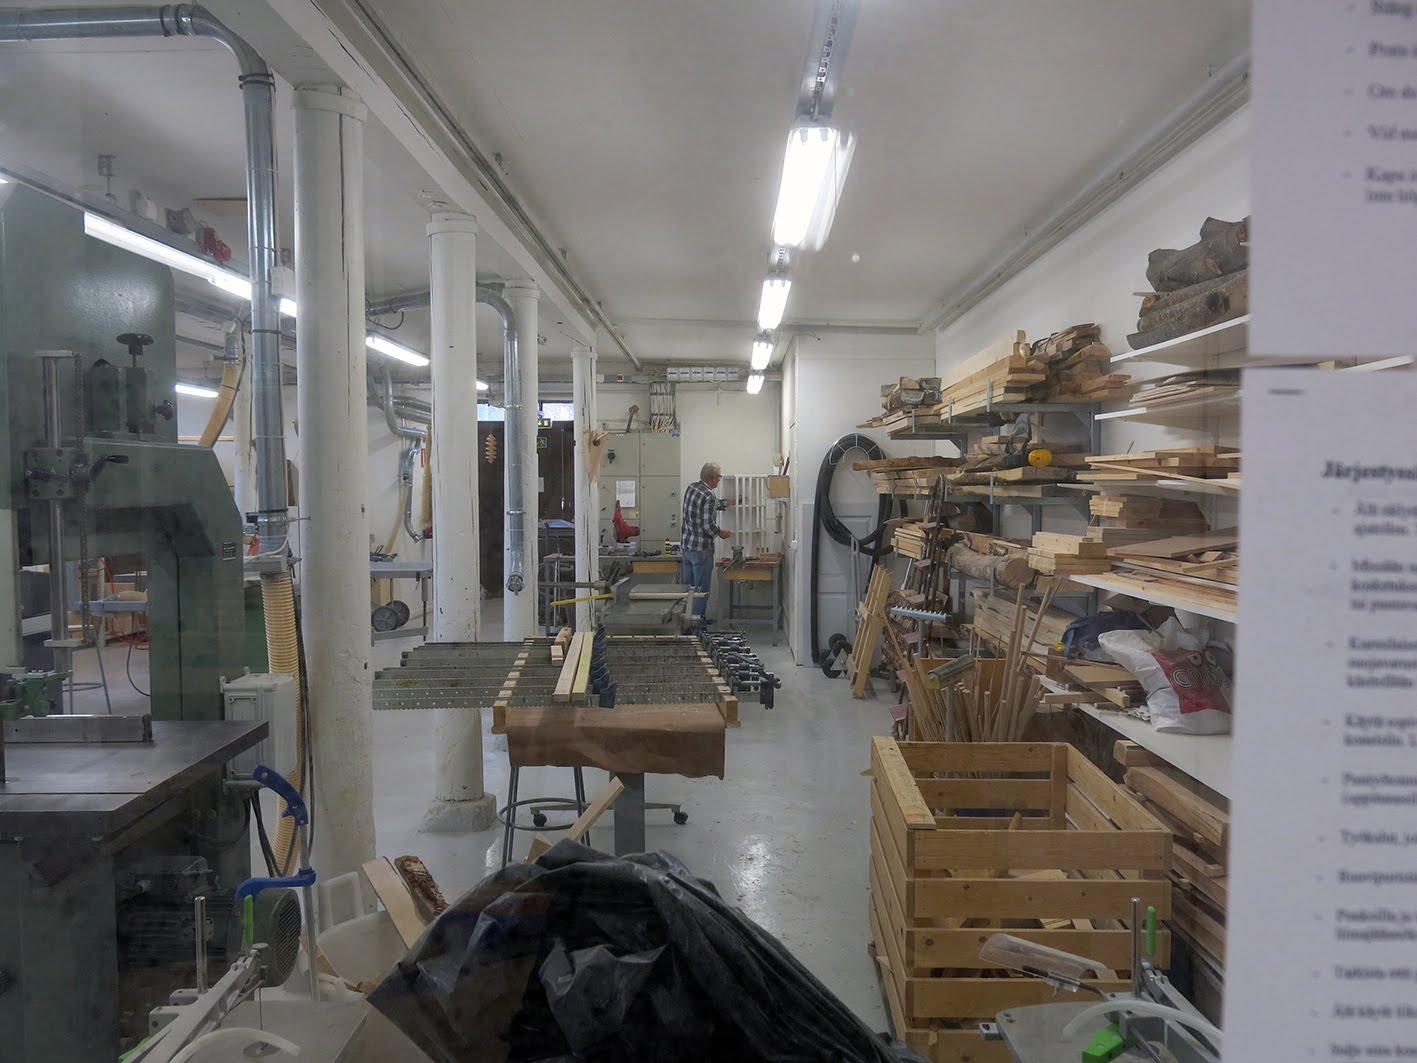 Senior-slöjdgruppens verkstad i Vasa